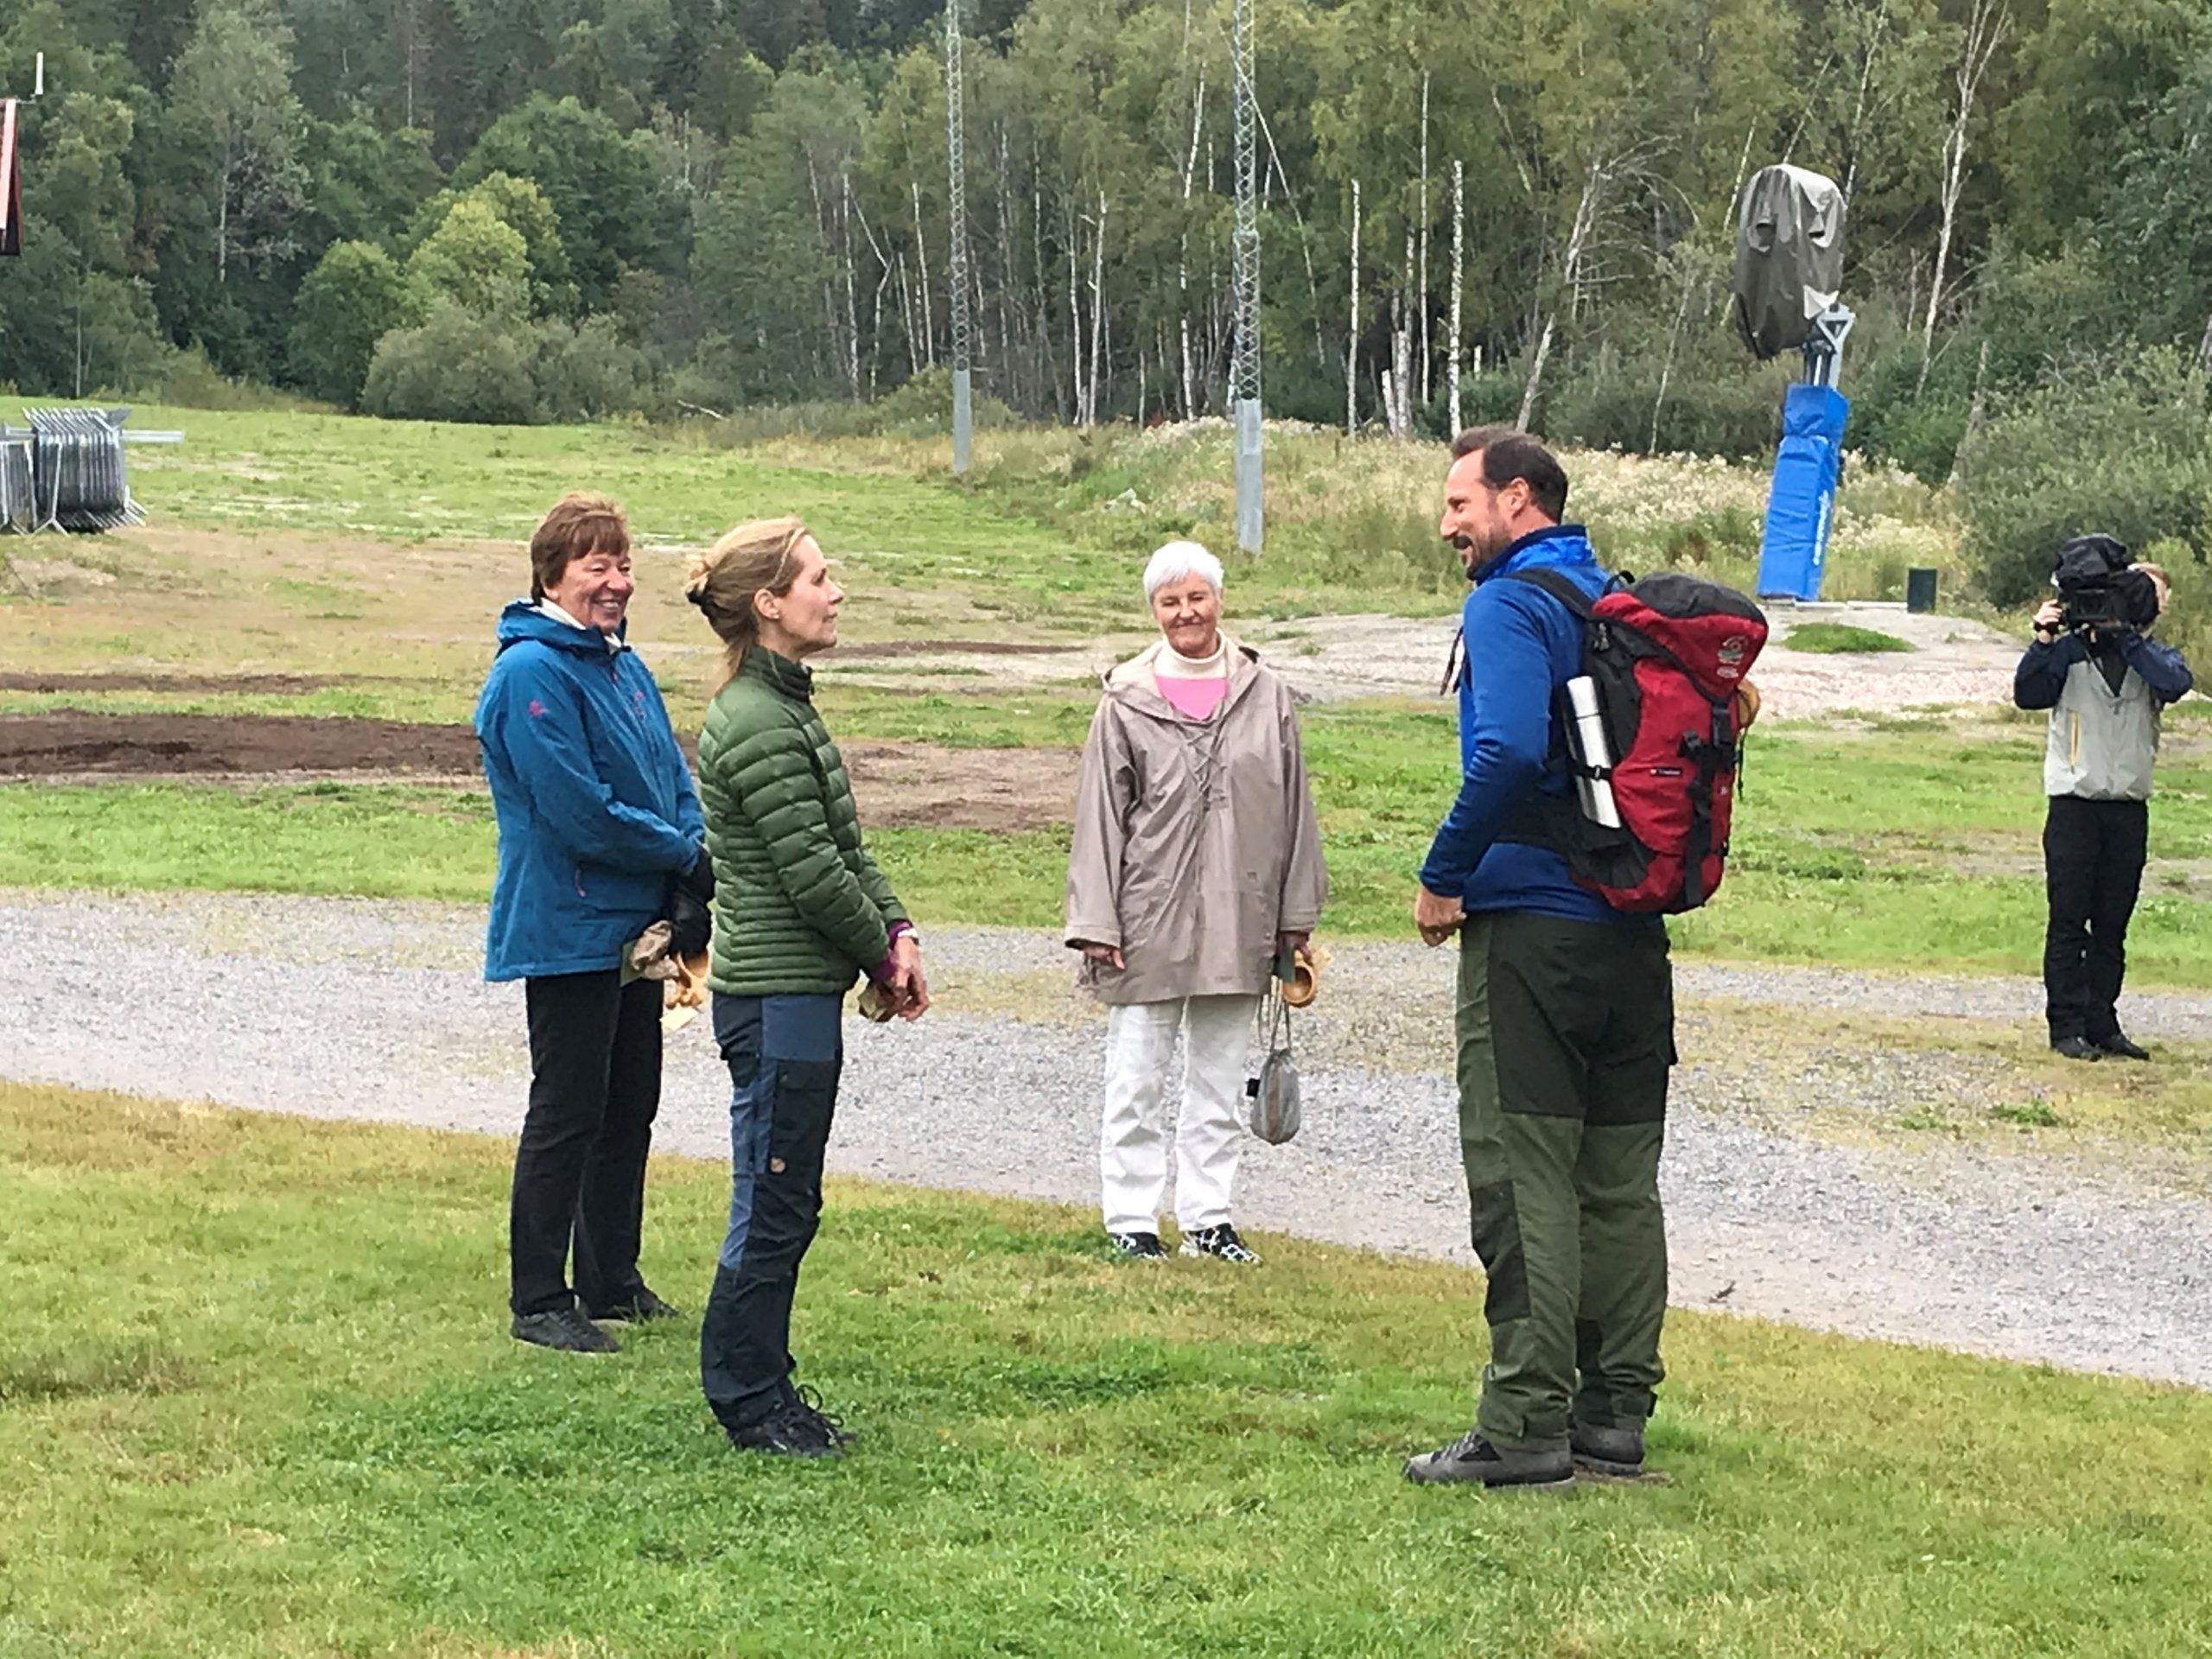 Ordfører i Oslo Marianne Borgen, riksantikvar Hanna Geiran, fylkesmann Valgerd Svarstad Haugland og H.K.H. Kronprins Haakon